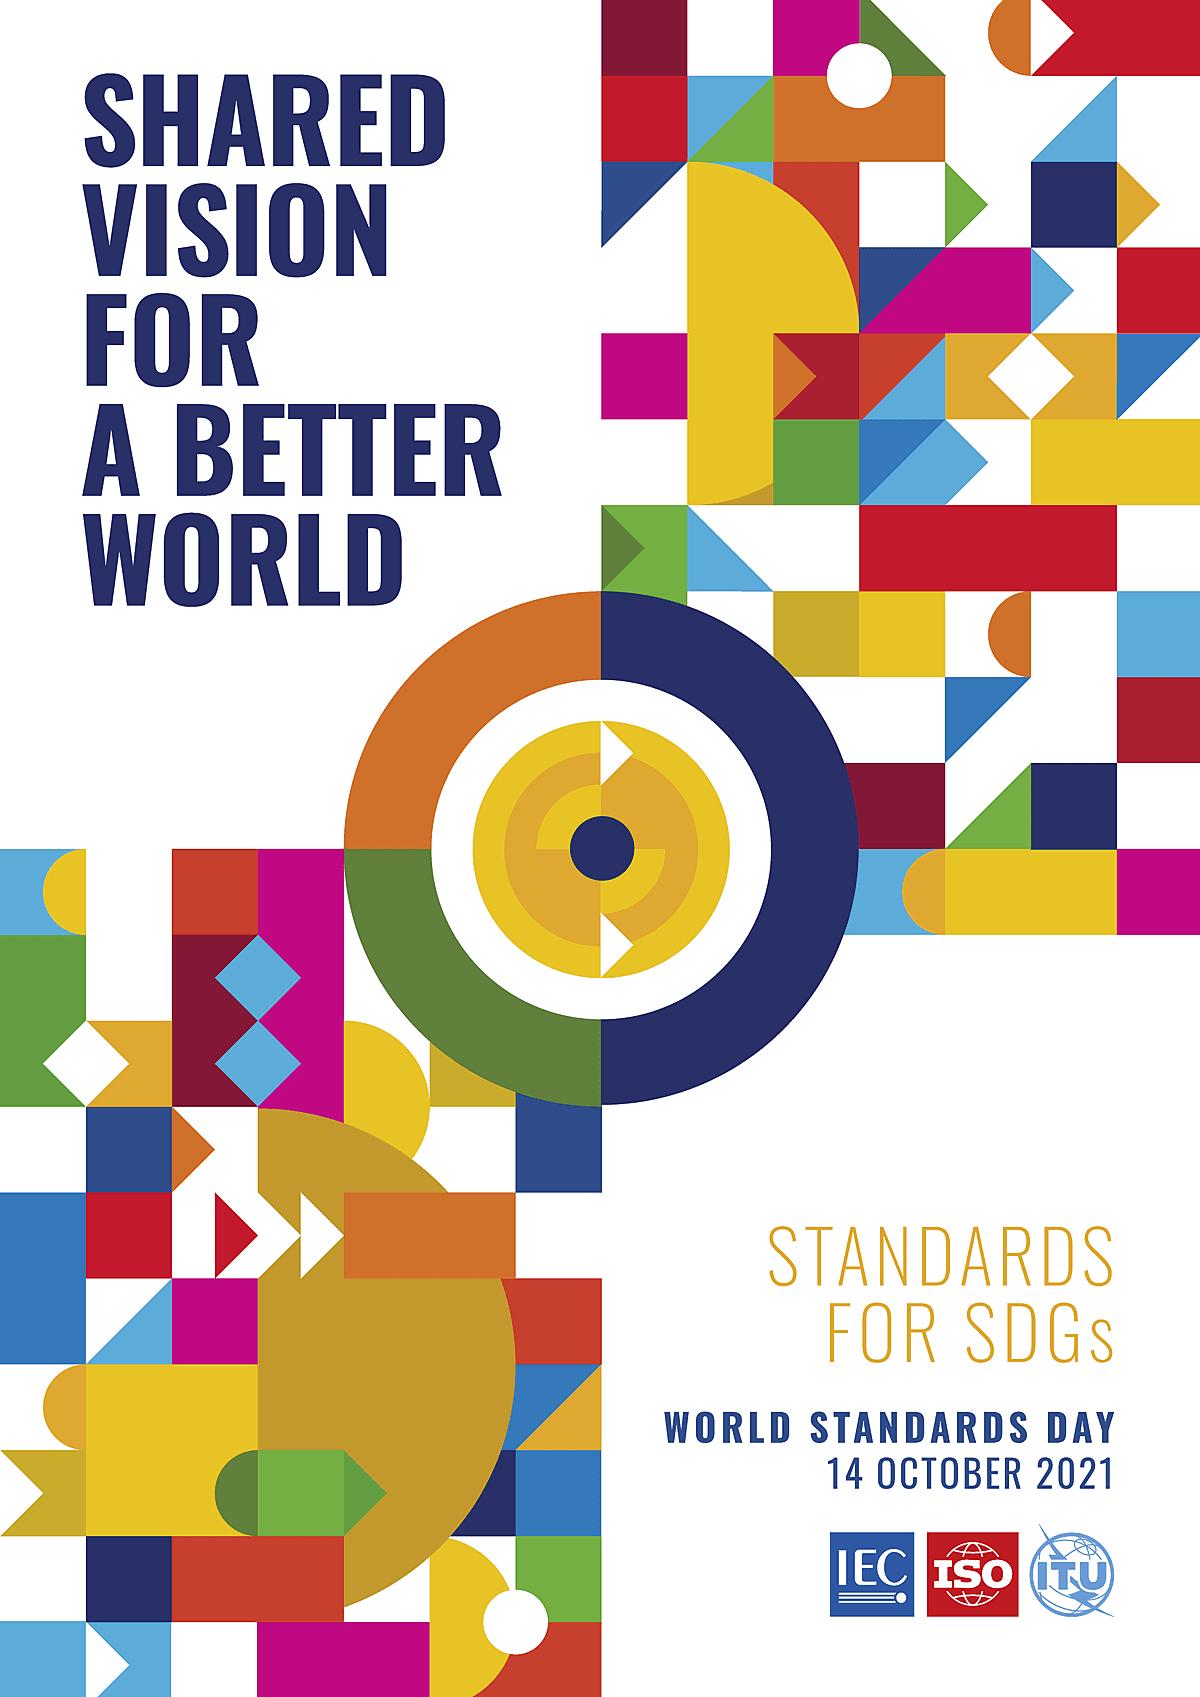 Happy World Standards Day!